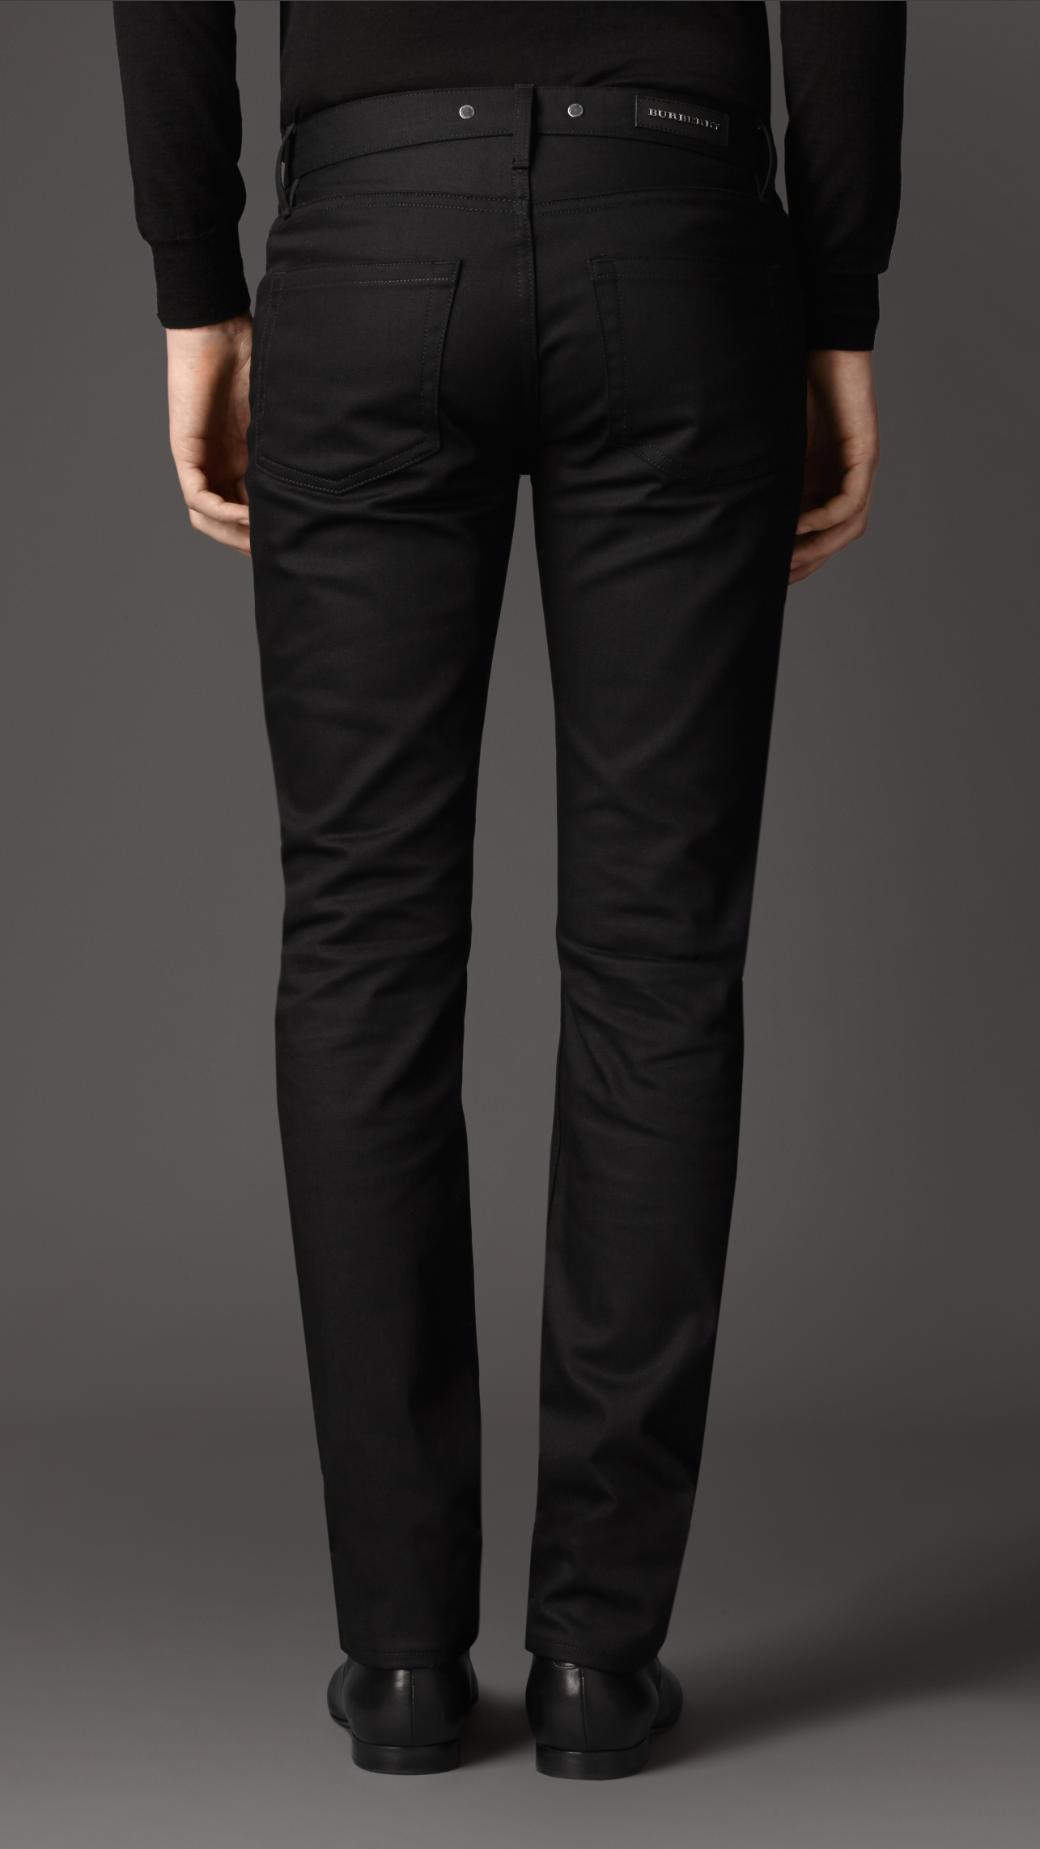 Lyst Burberry Steadman Black Slim Fit Jeans In Black For Men